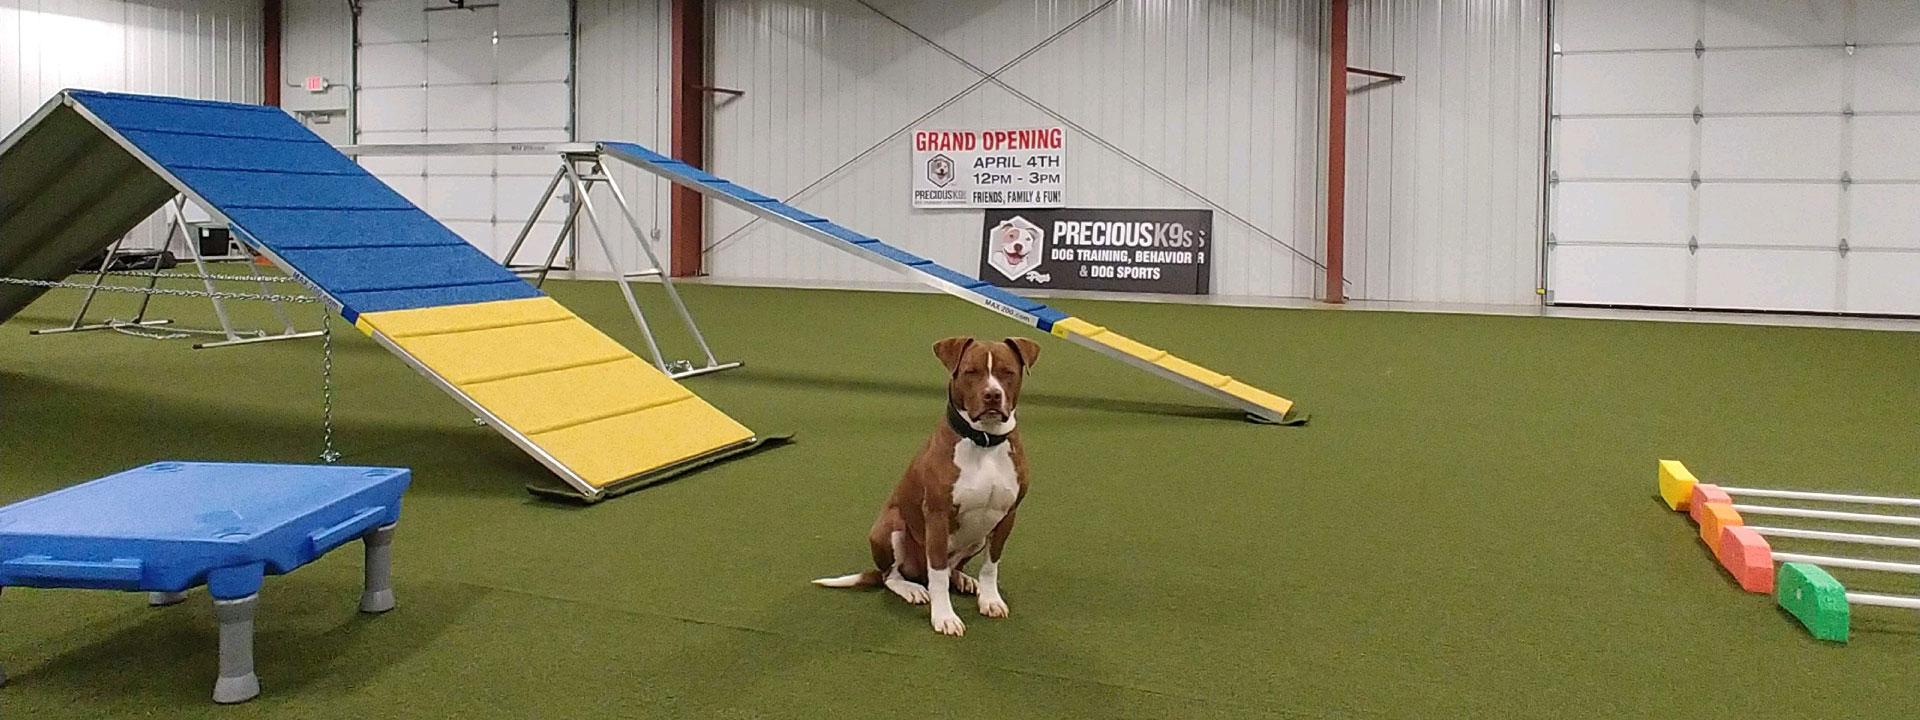 Precious K9s - Dog Training, Dog Behavior, Springfield, Missouri areana